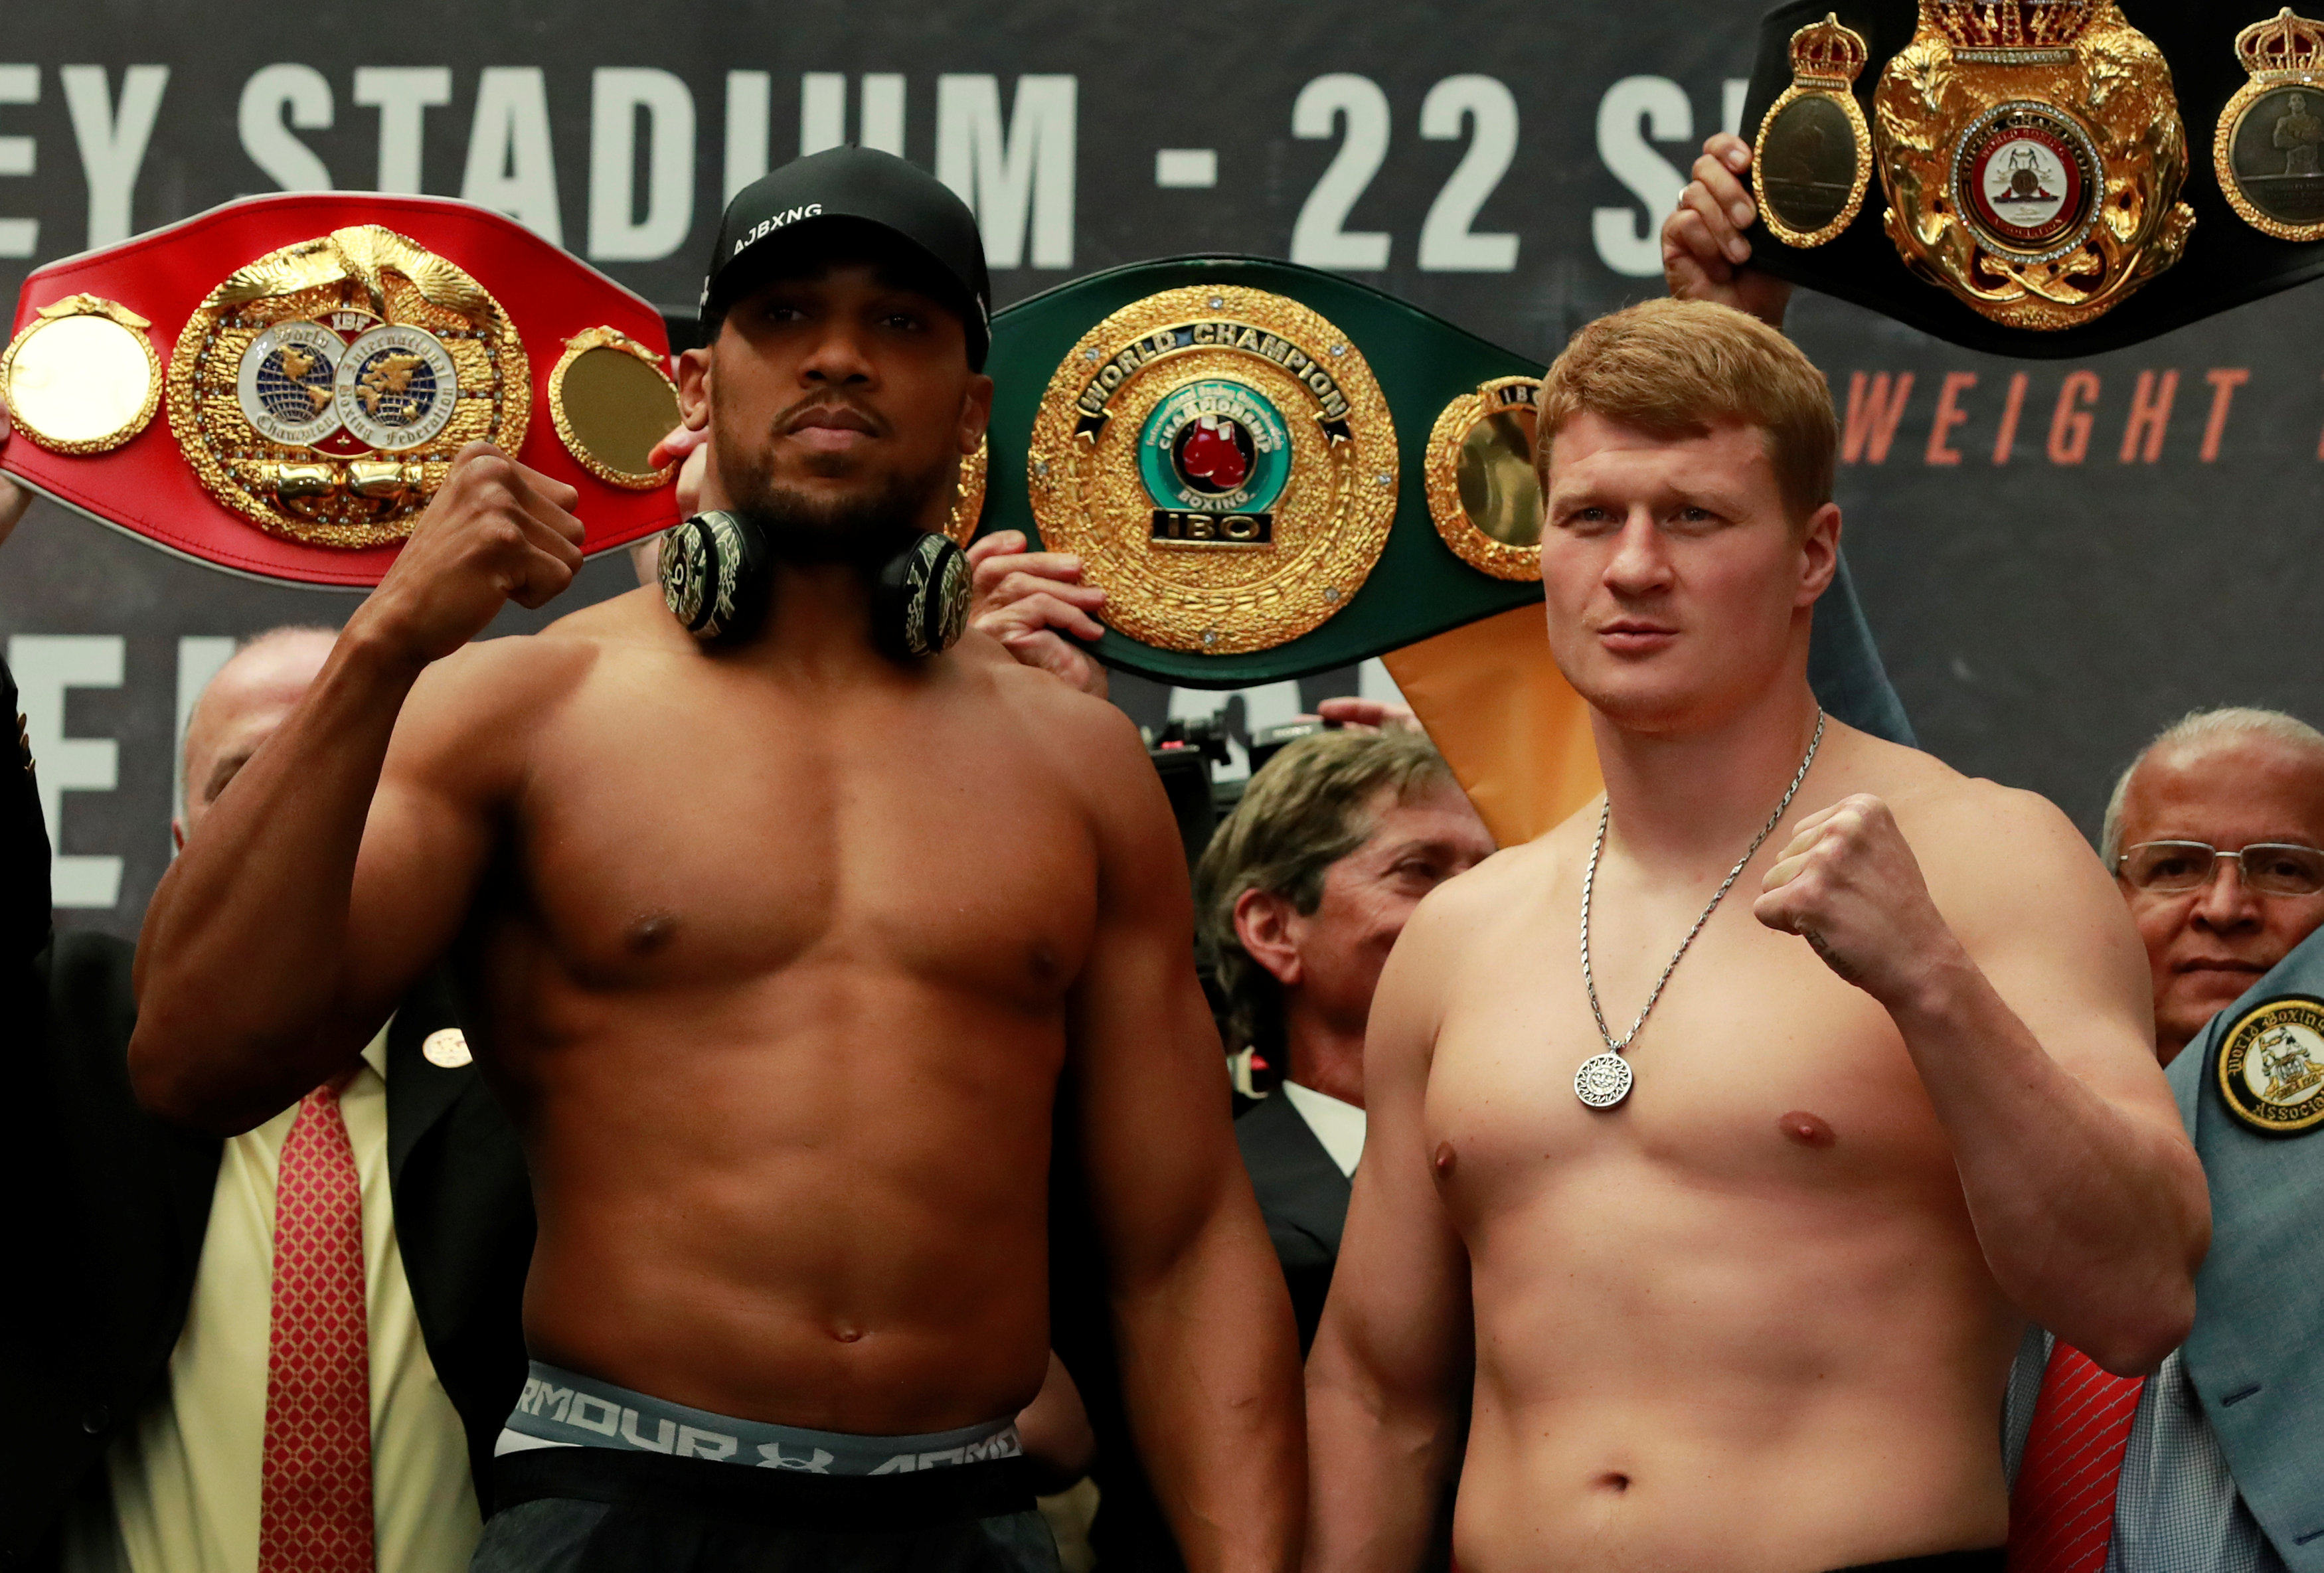 Deontay Wilder v Tyson Fury: Fight confirmed for 1 December